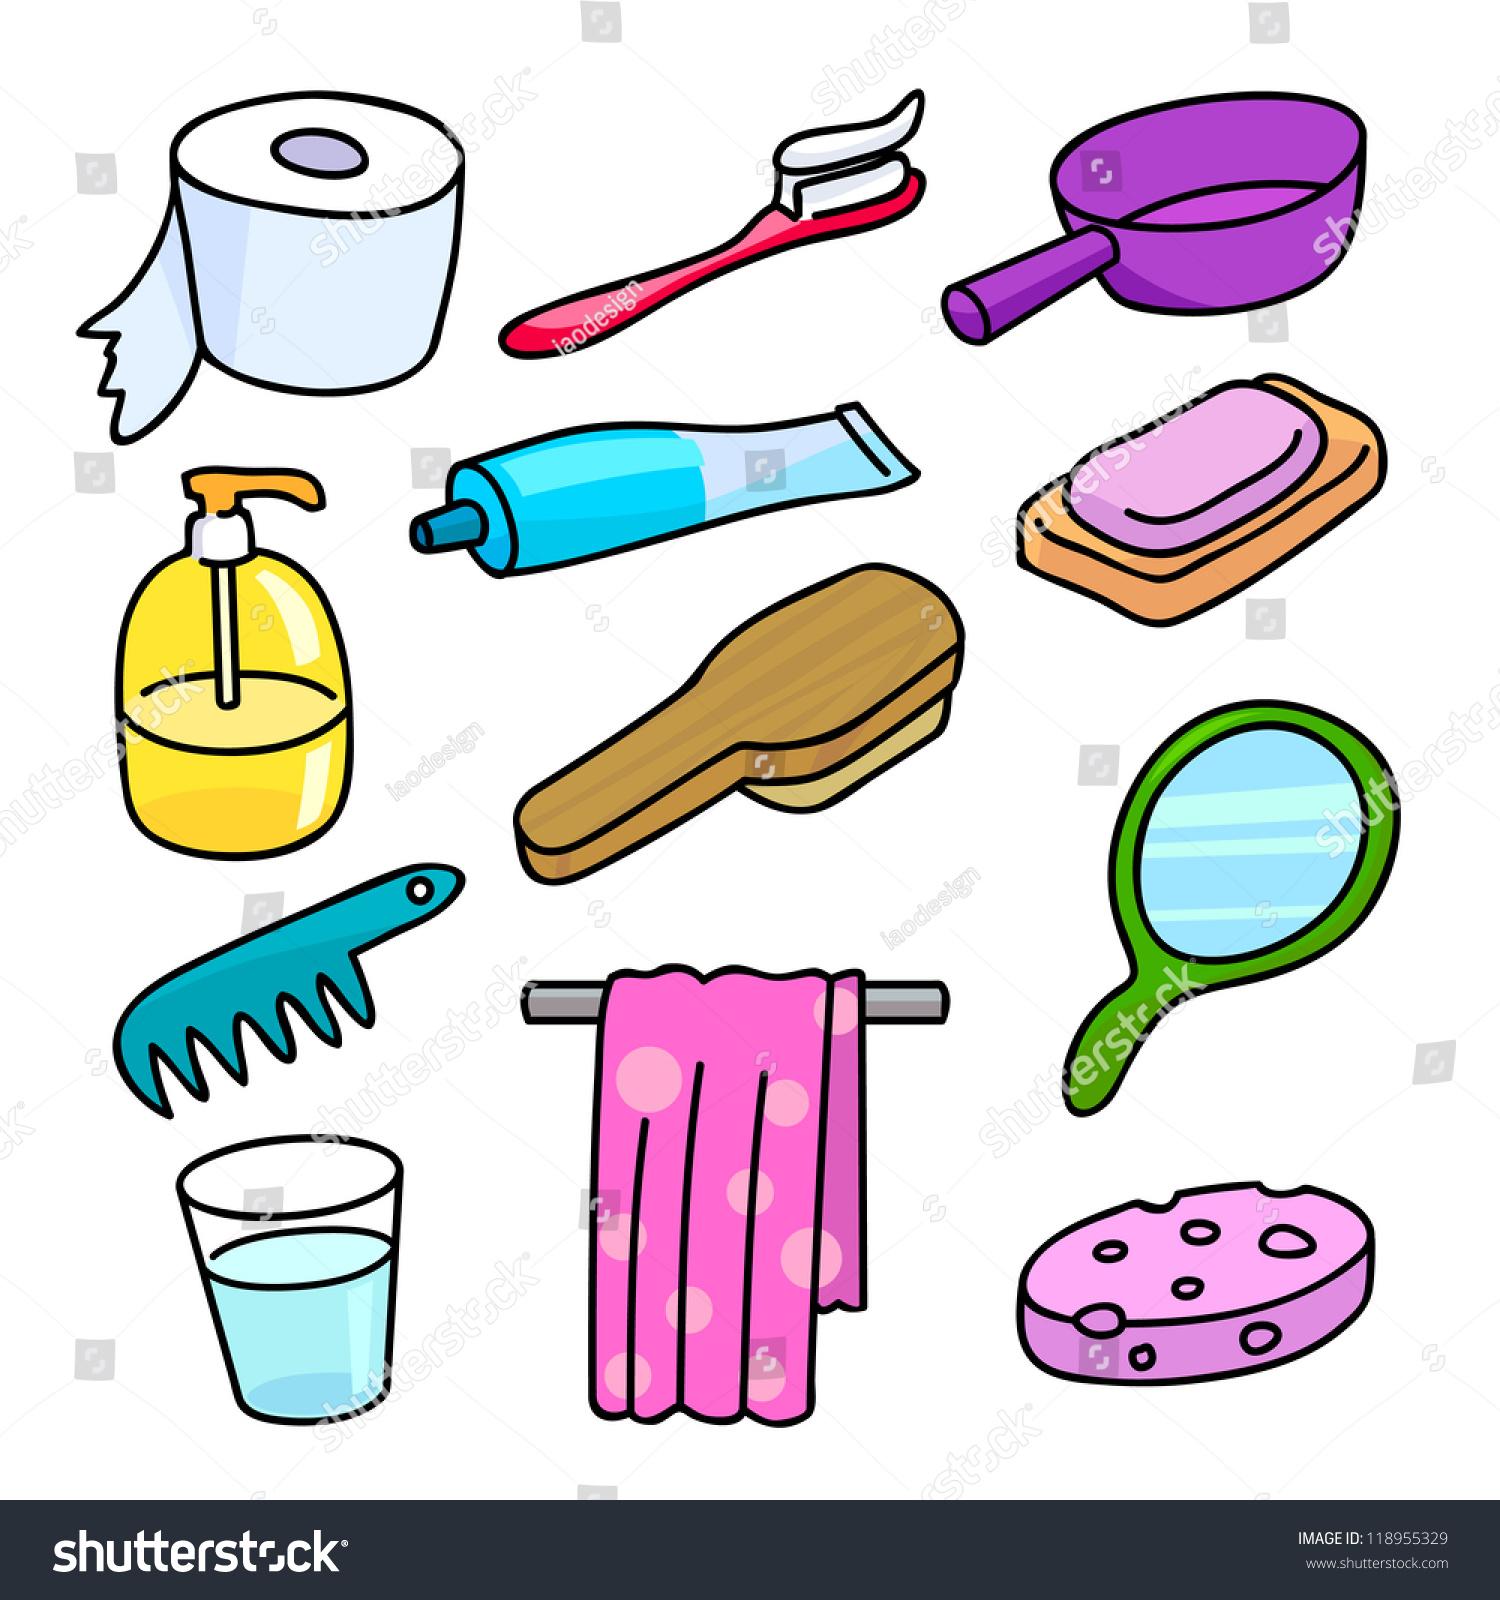 Bathroom equipment icon set cartoon style with vector design 118955329 shutterstock - Image of bathroom ...